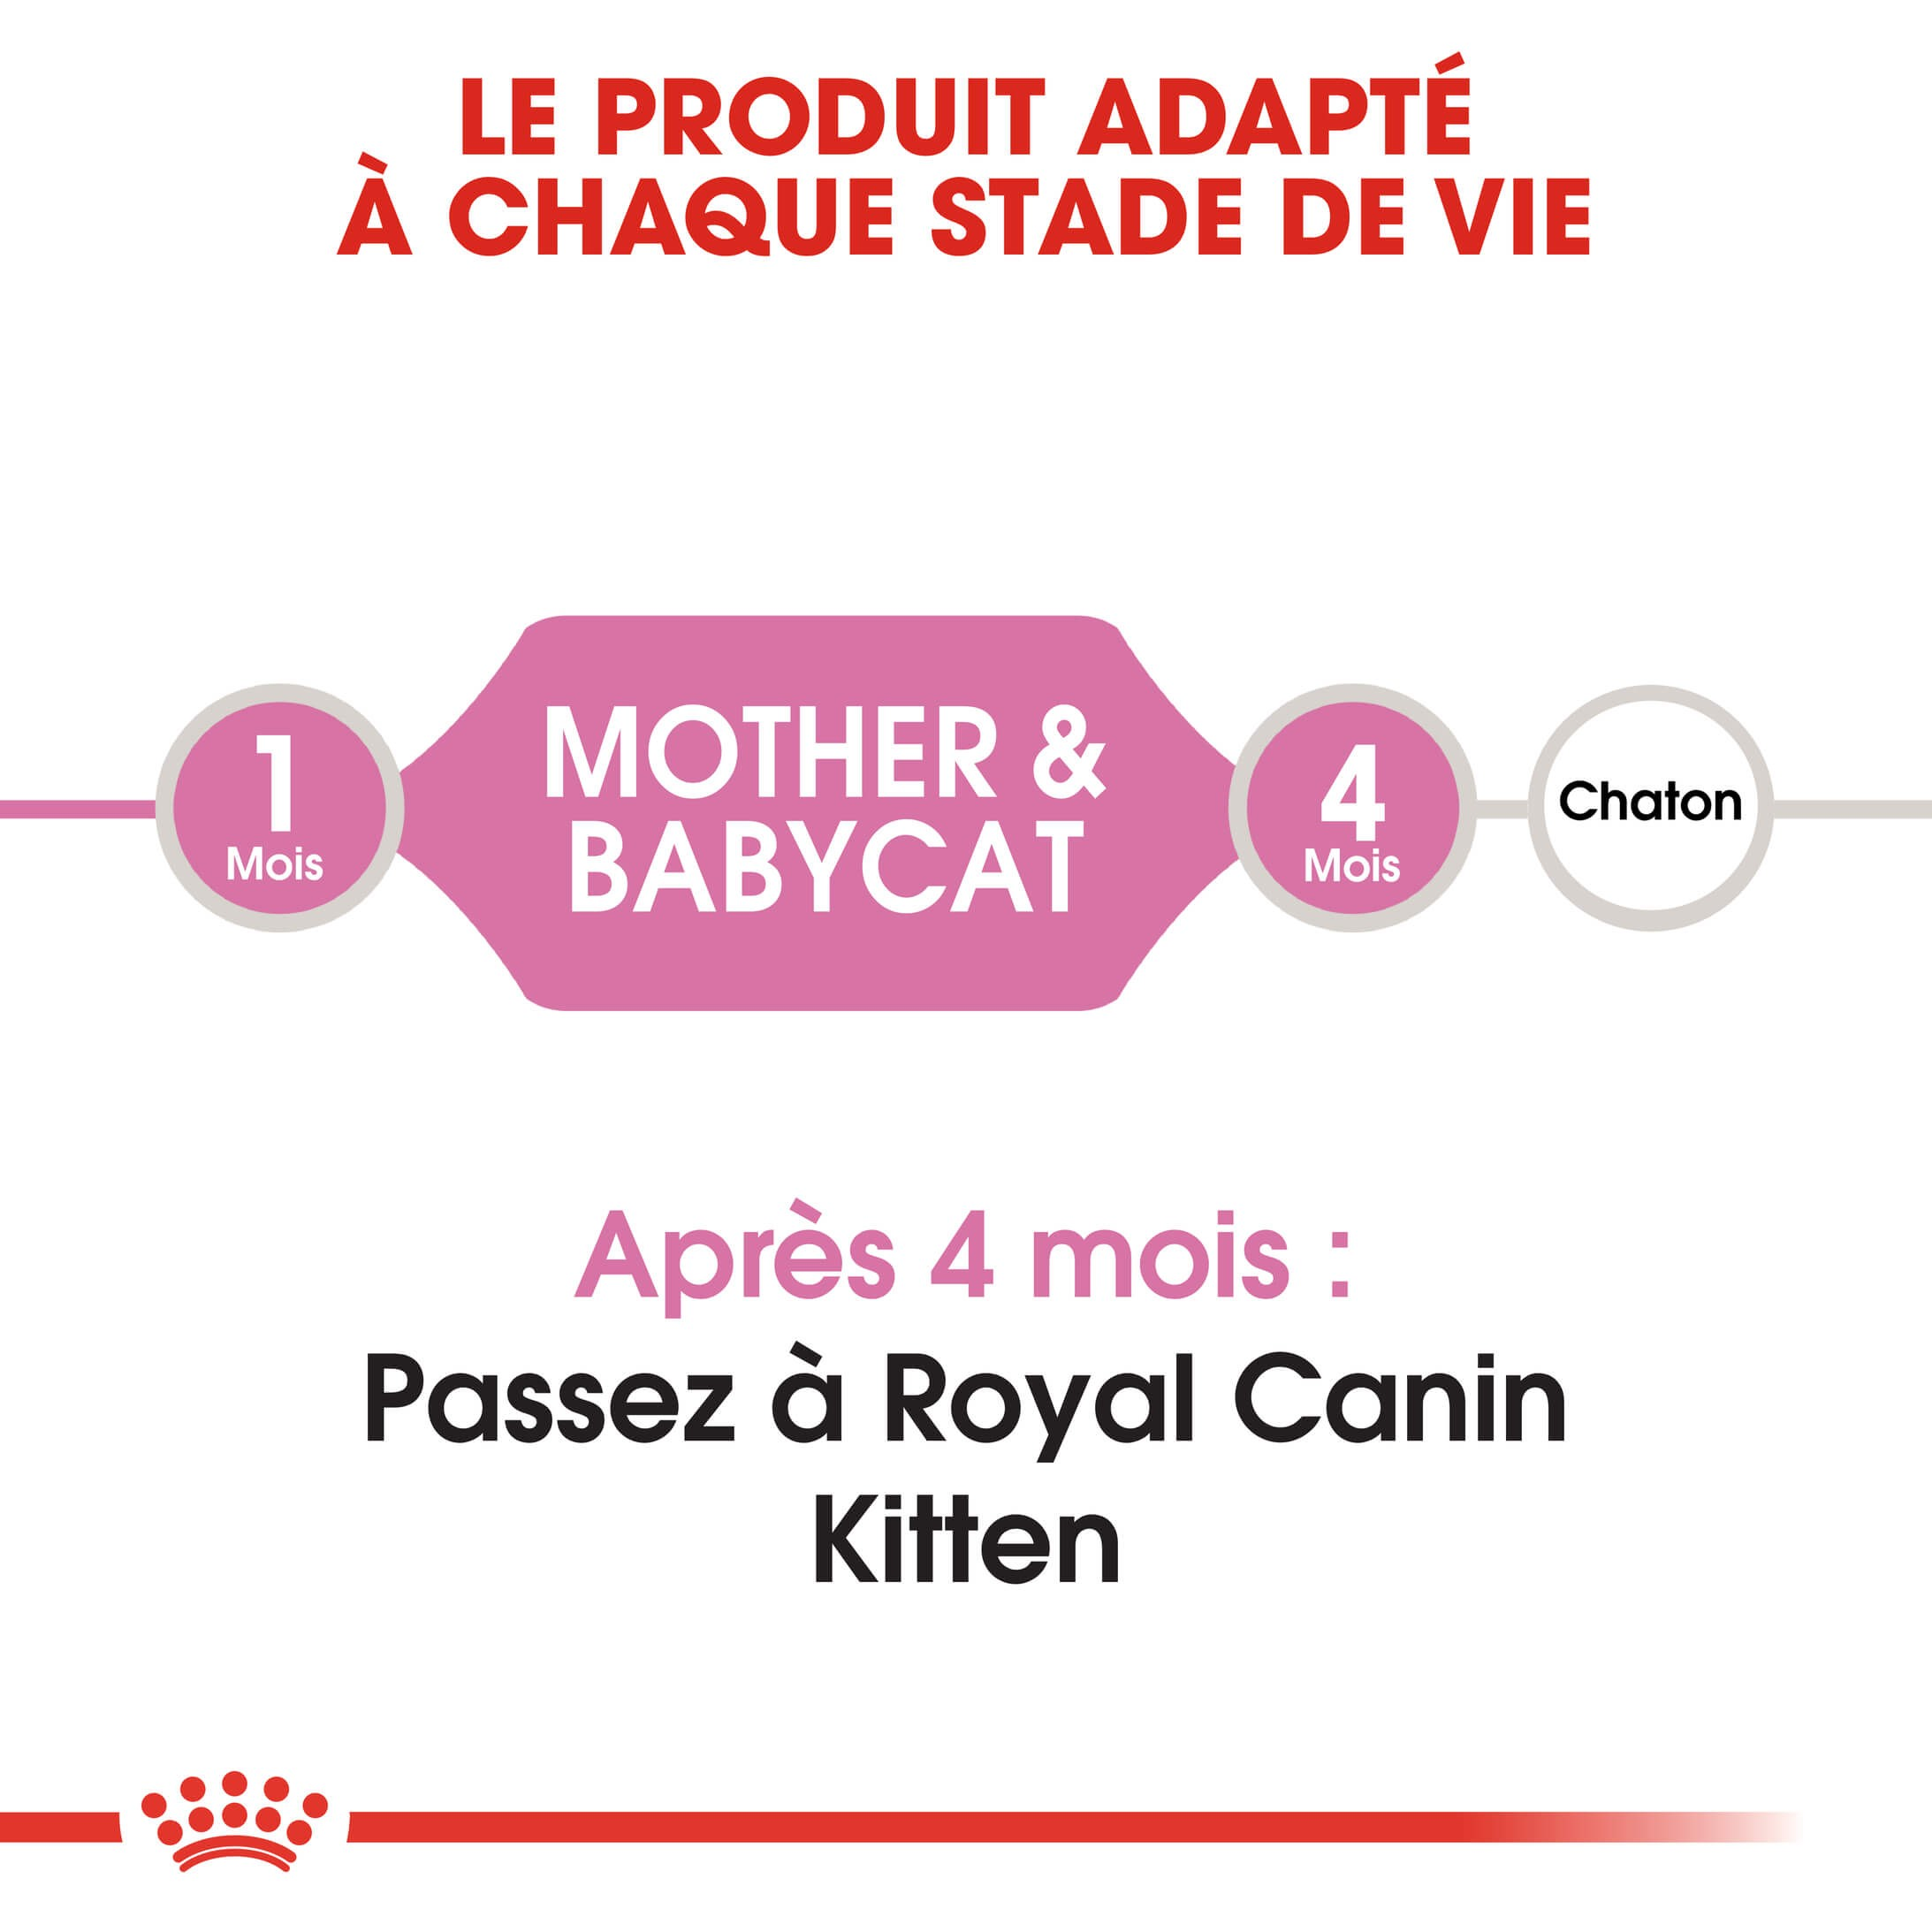 Royal Canin Chaton Babycat 34